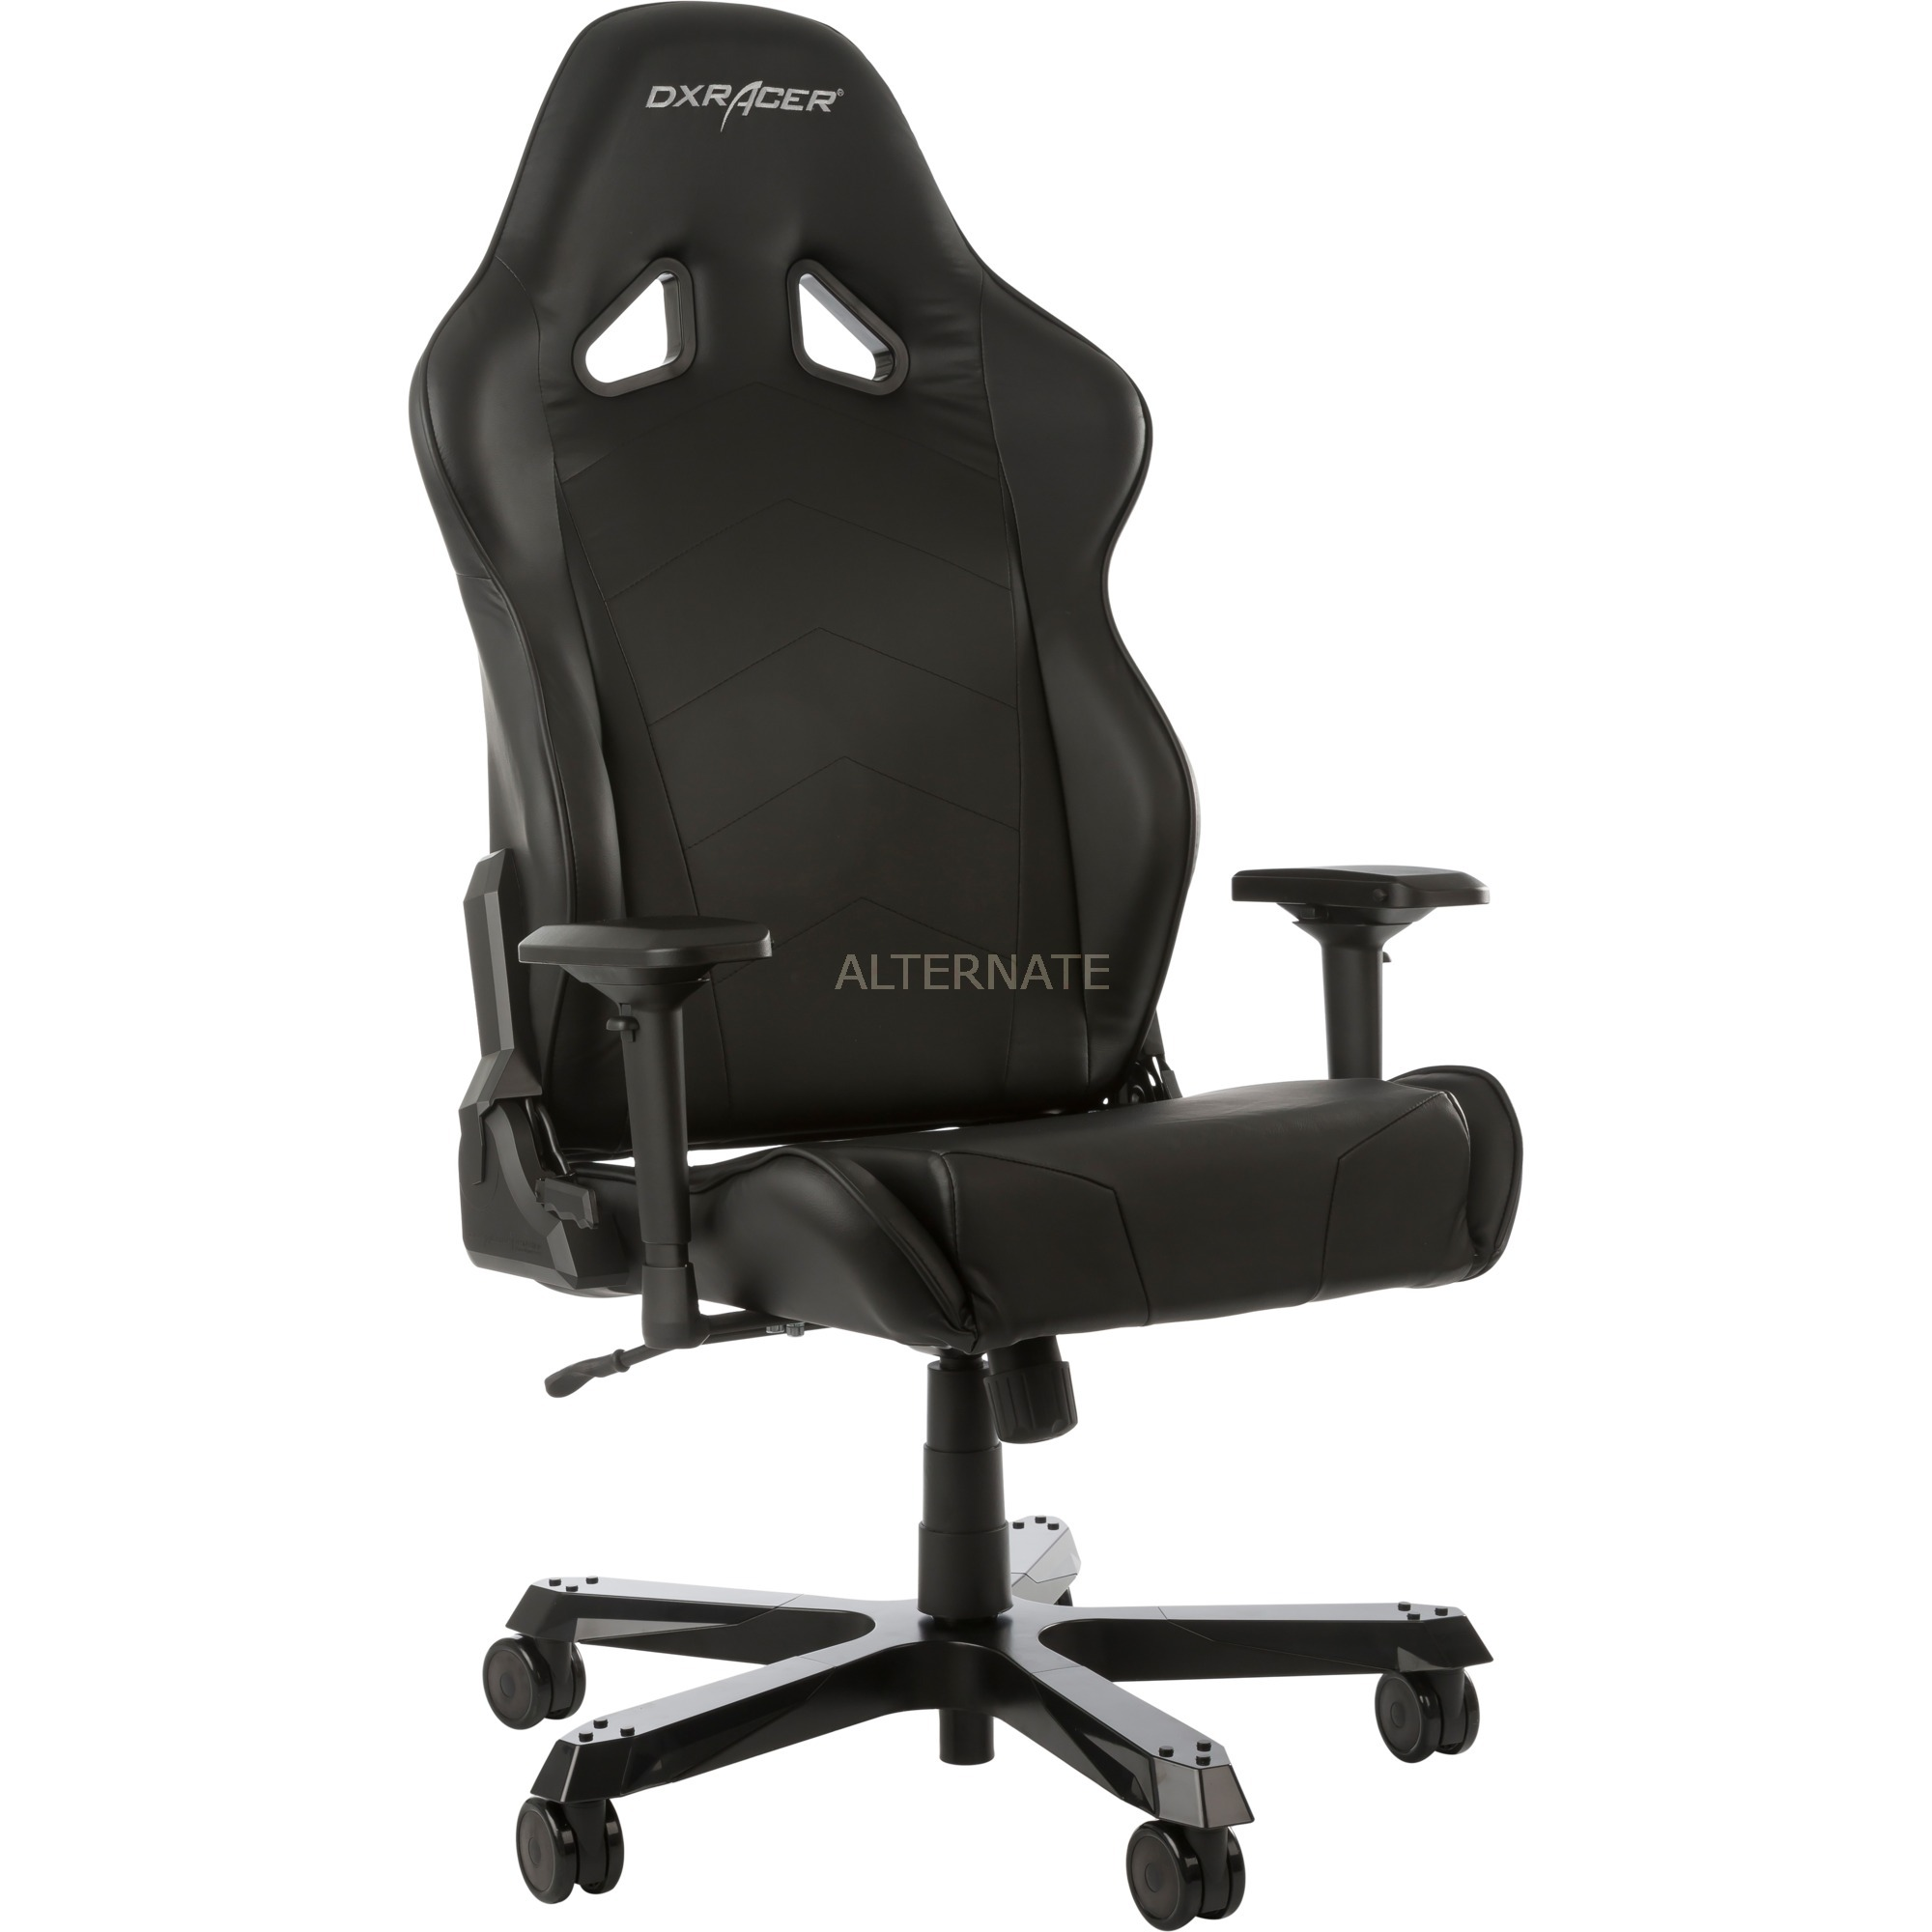 Tank Gaming Chair, Spil pladser